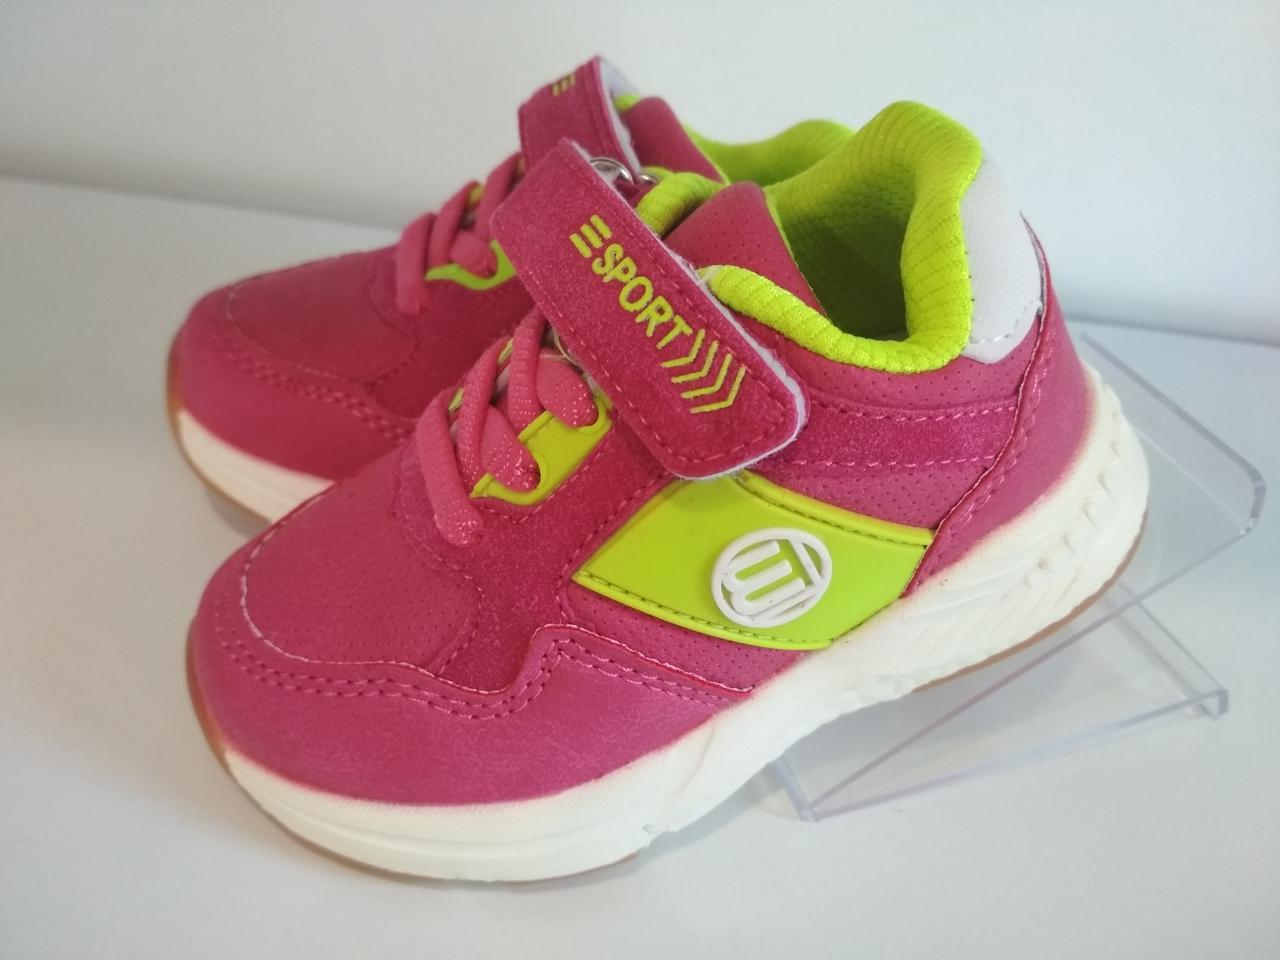 Кроссовки для девочки Tom.m р. 21 (13 см)